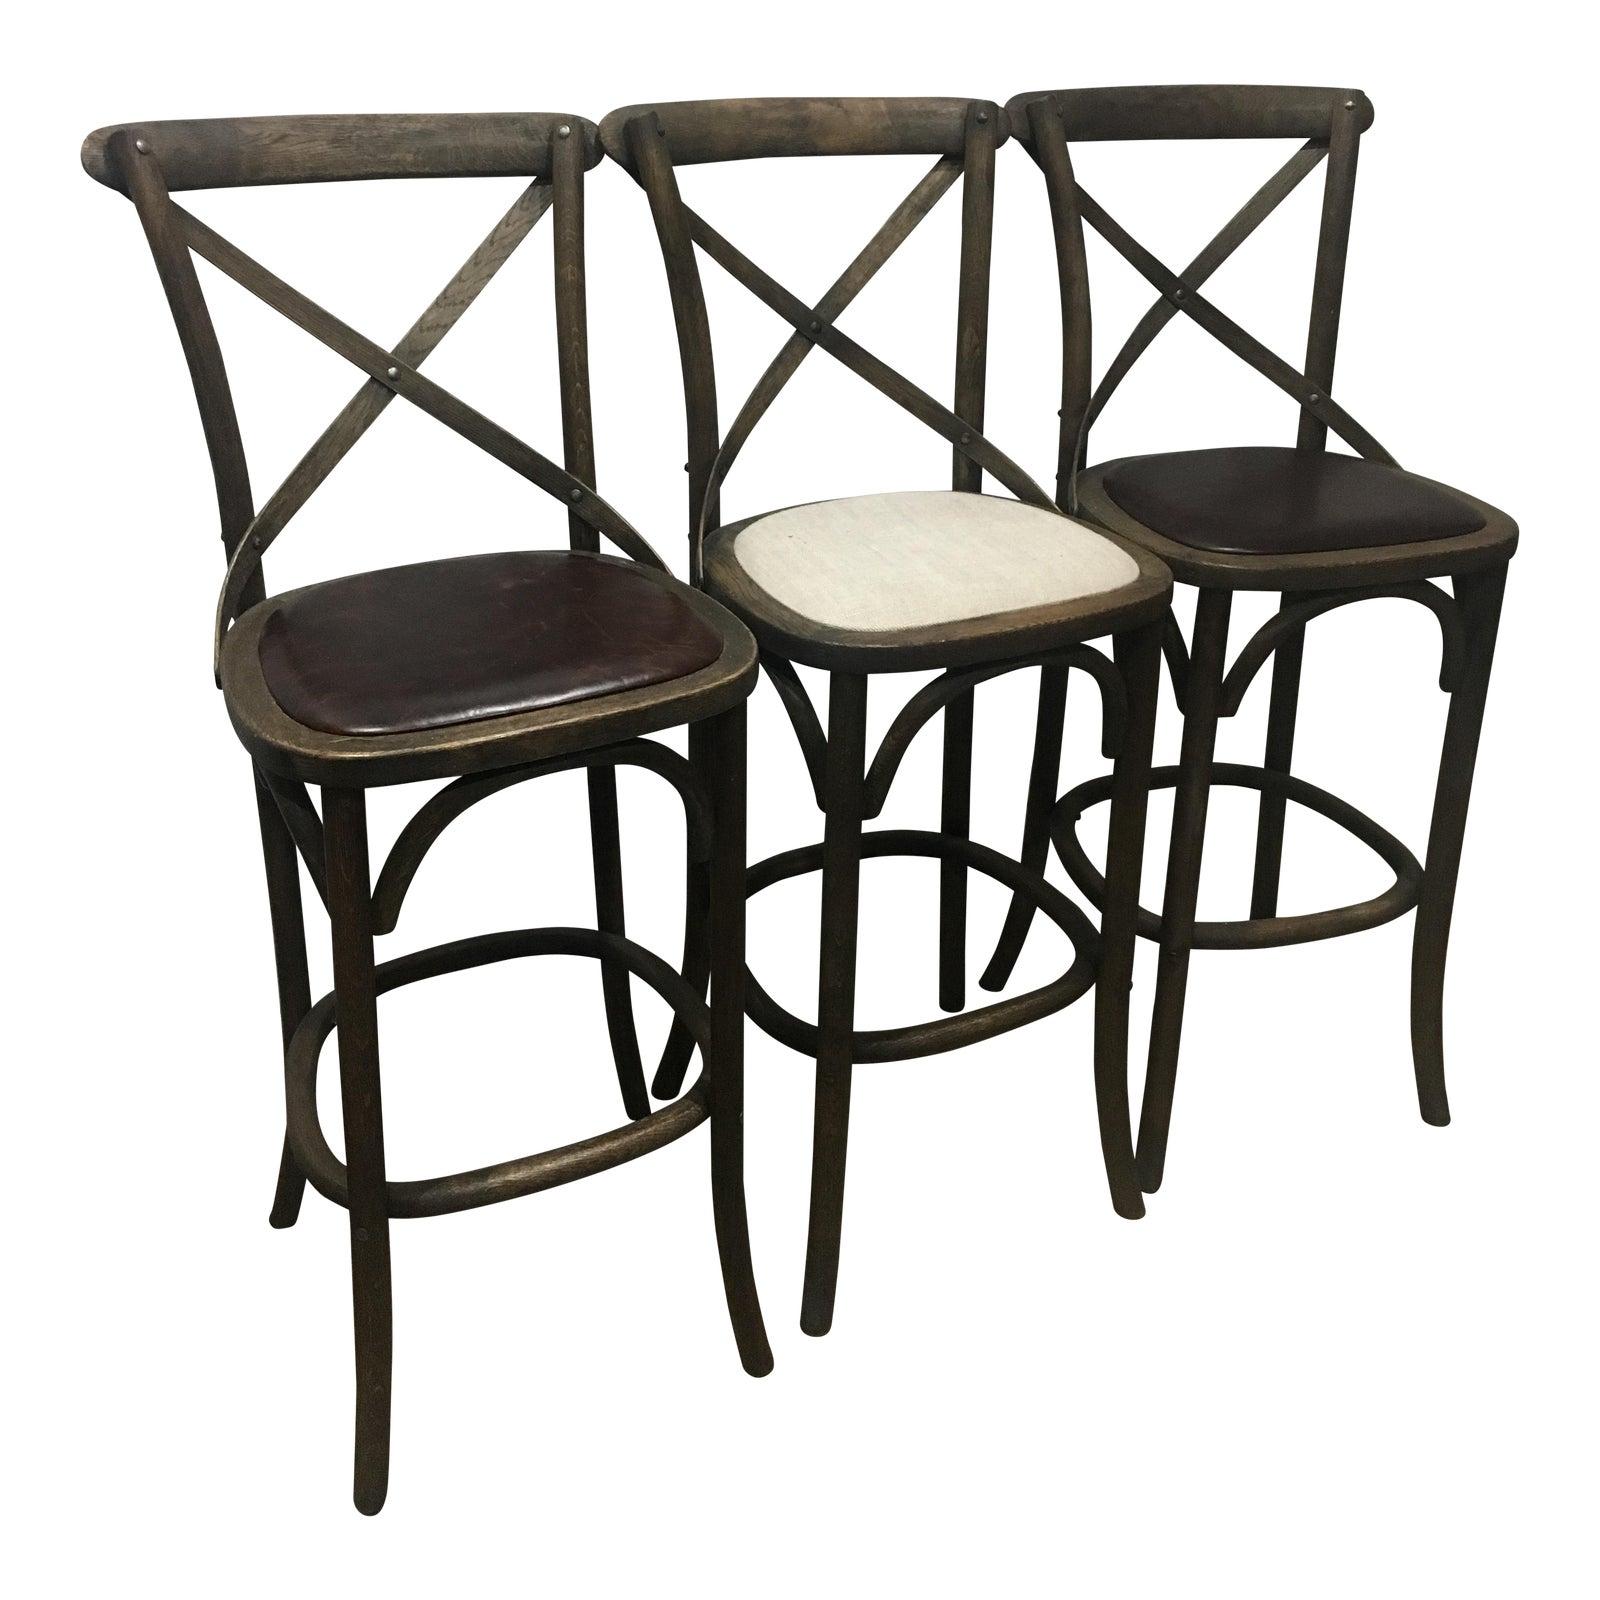 restoration hardware madeleine bar stools set of 3 chairish. Black Bedroom Furniture Sets. Home Design Ideas